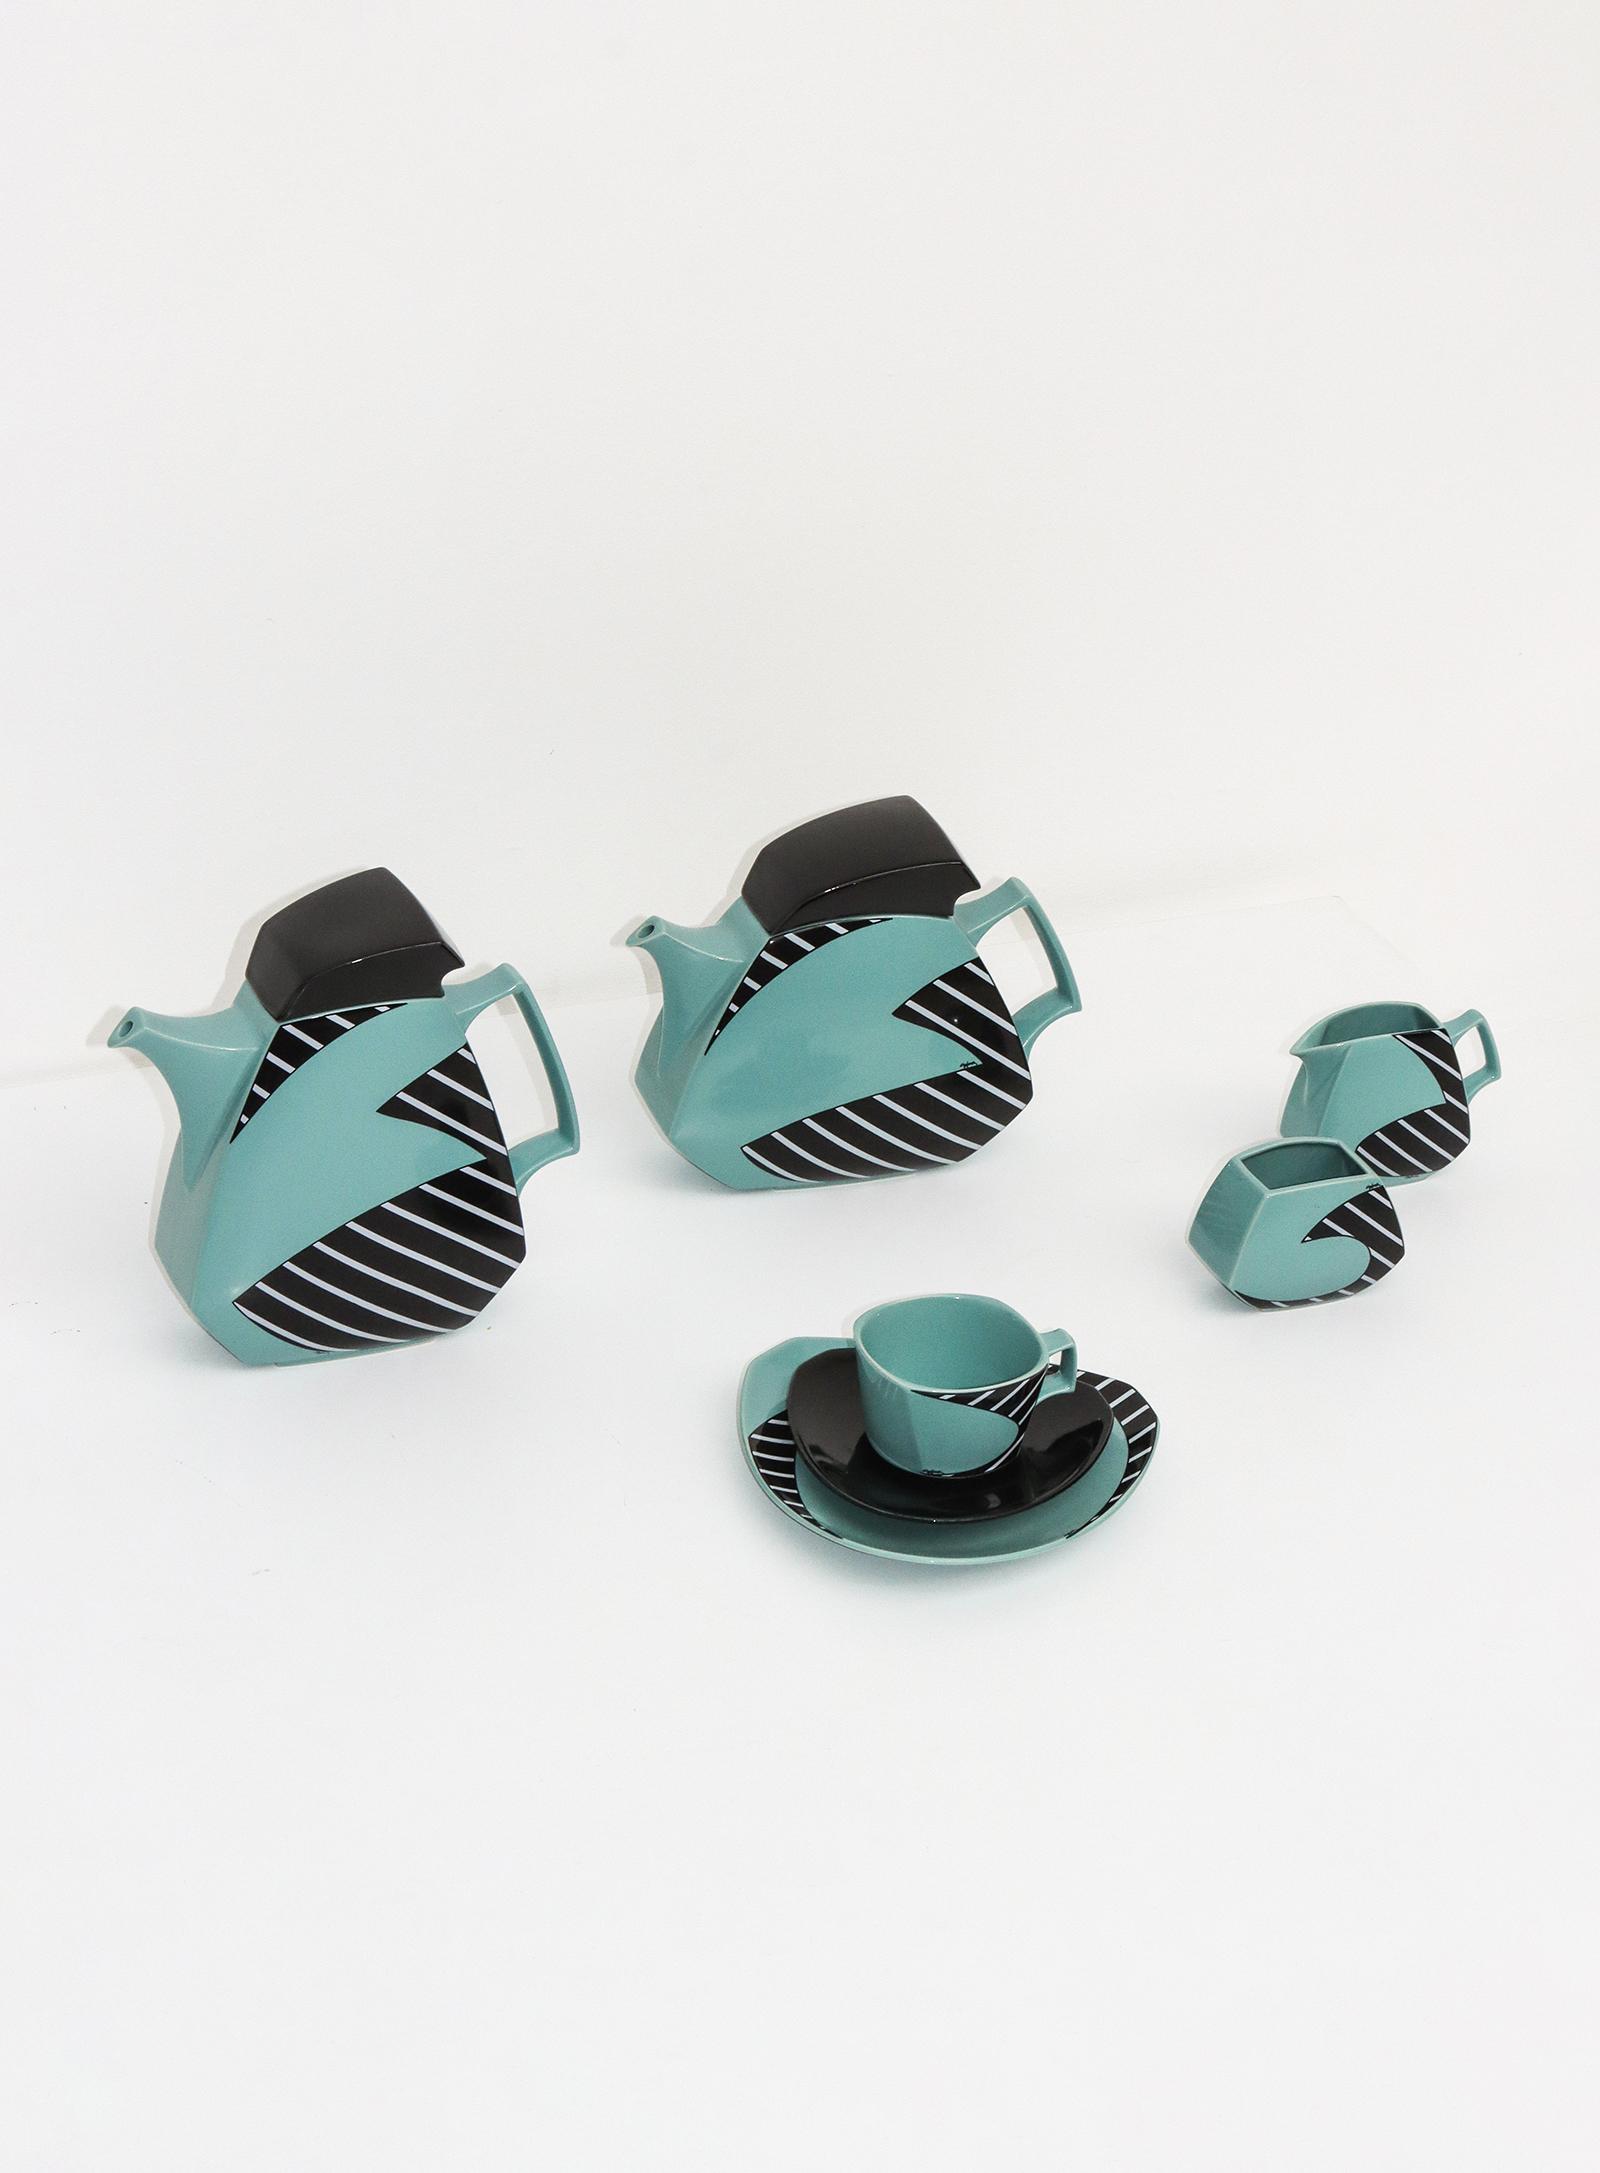 Flash Coffee and tea set by Dorothy Hafner for Rosenthalimage 1